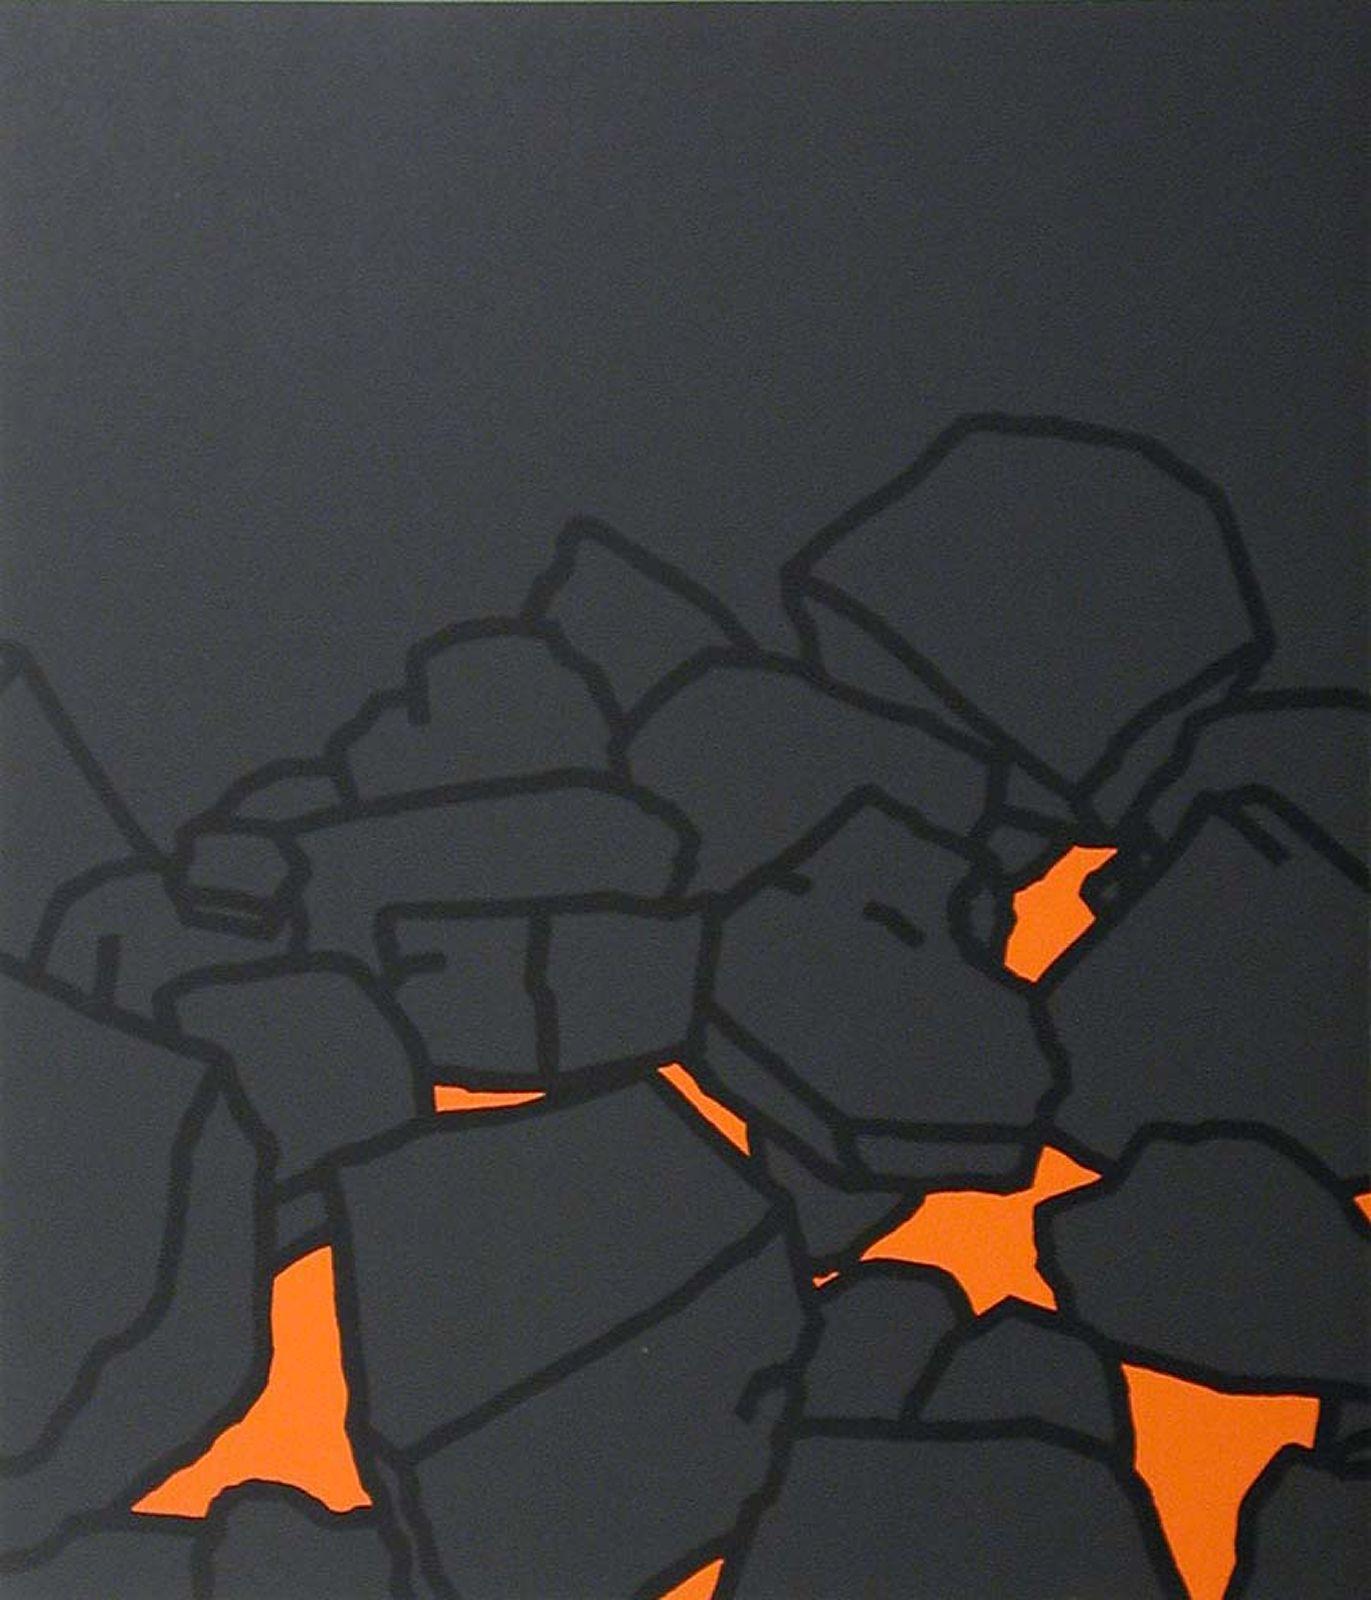 ART & ARTISTS: Patrick Caulfield - part 1